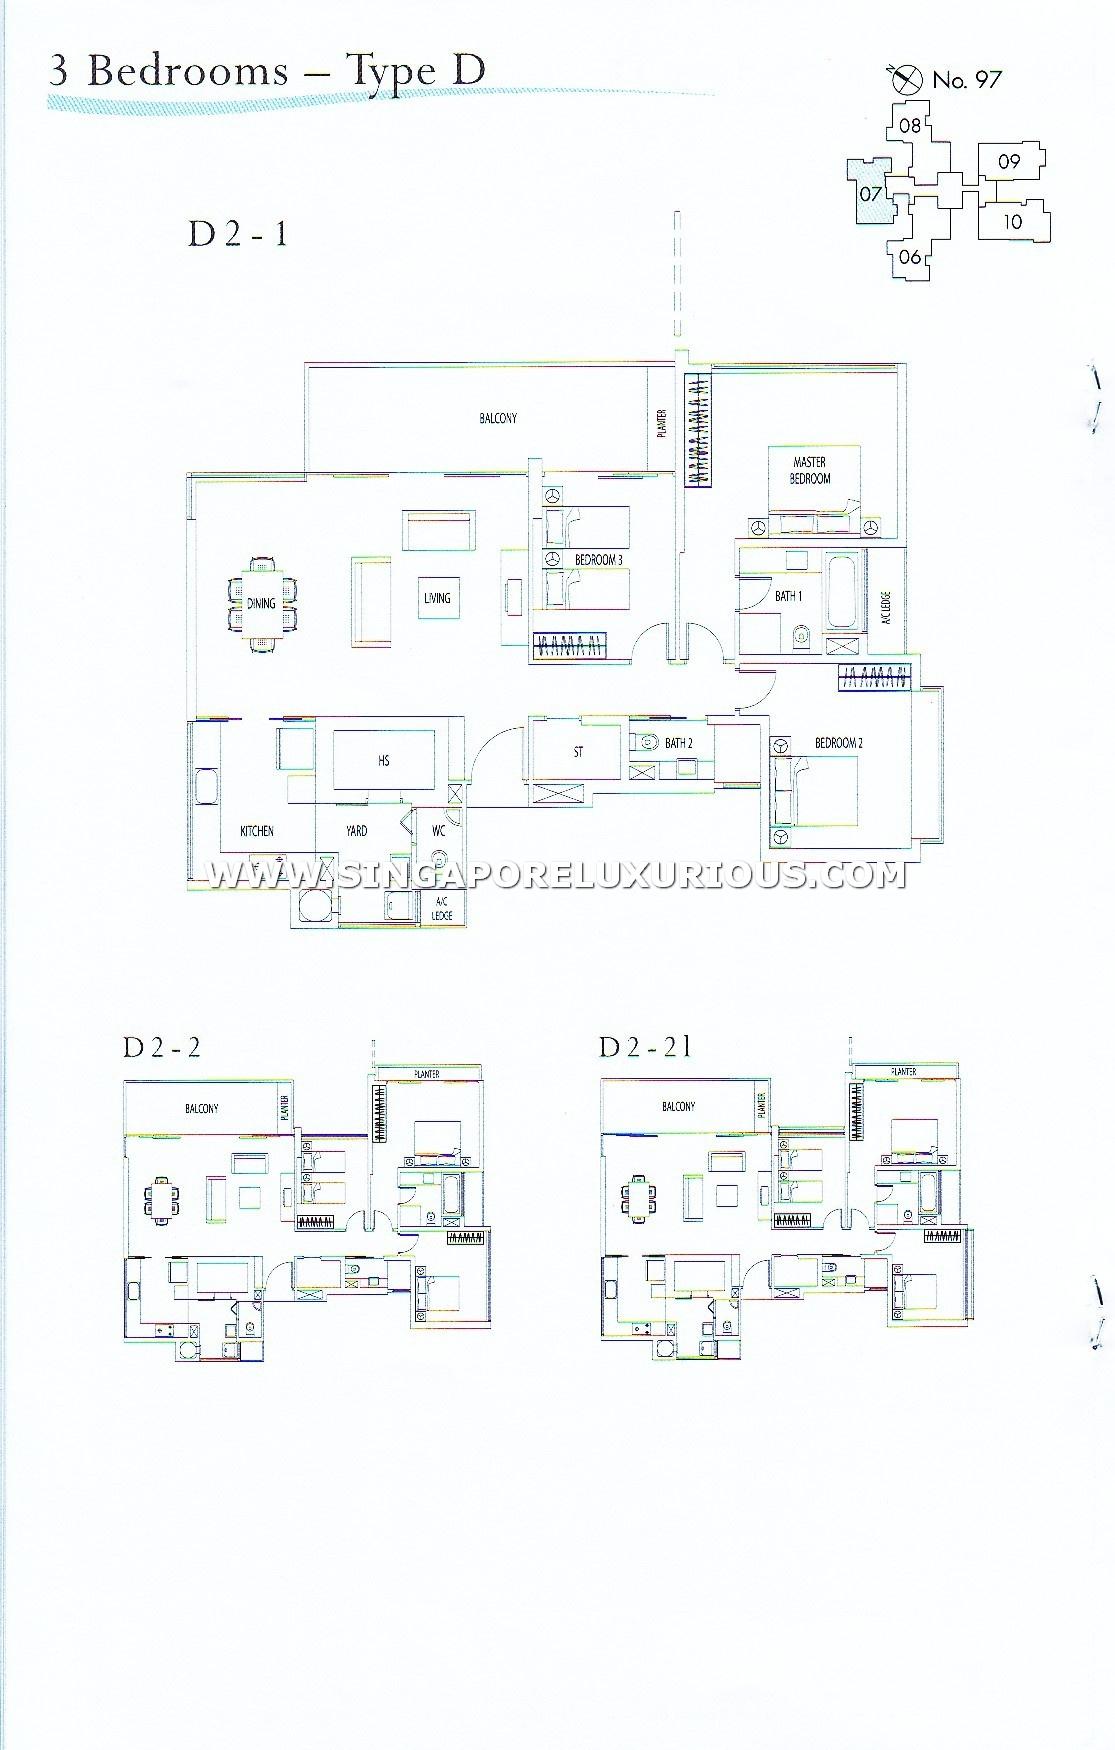 Rivergate Site Amp Floor Plan Singapore Luxurious Property